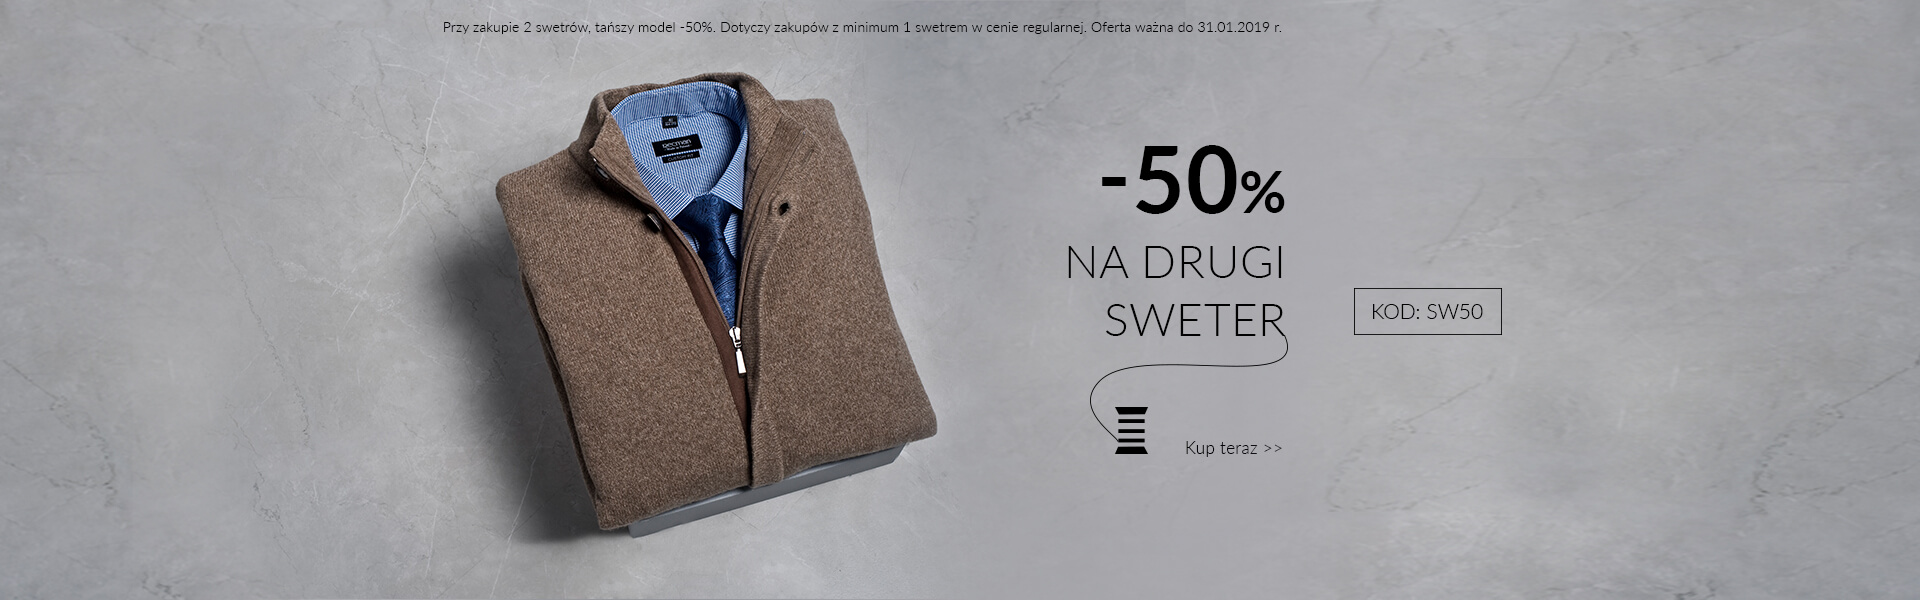 Sweter - 50%